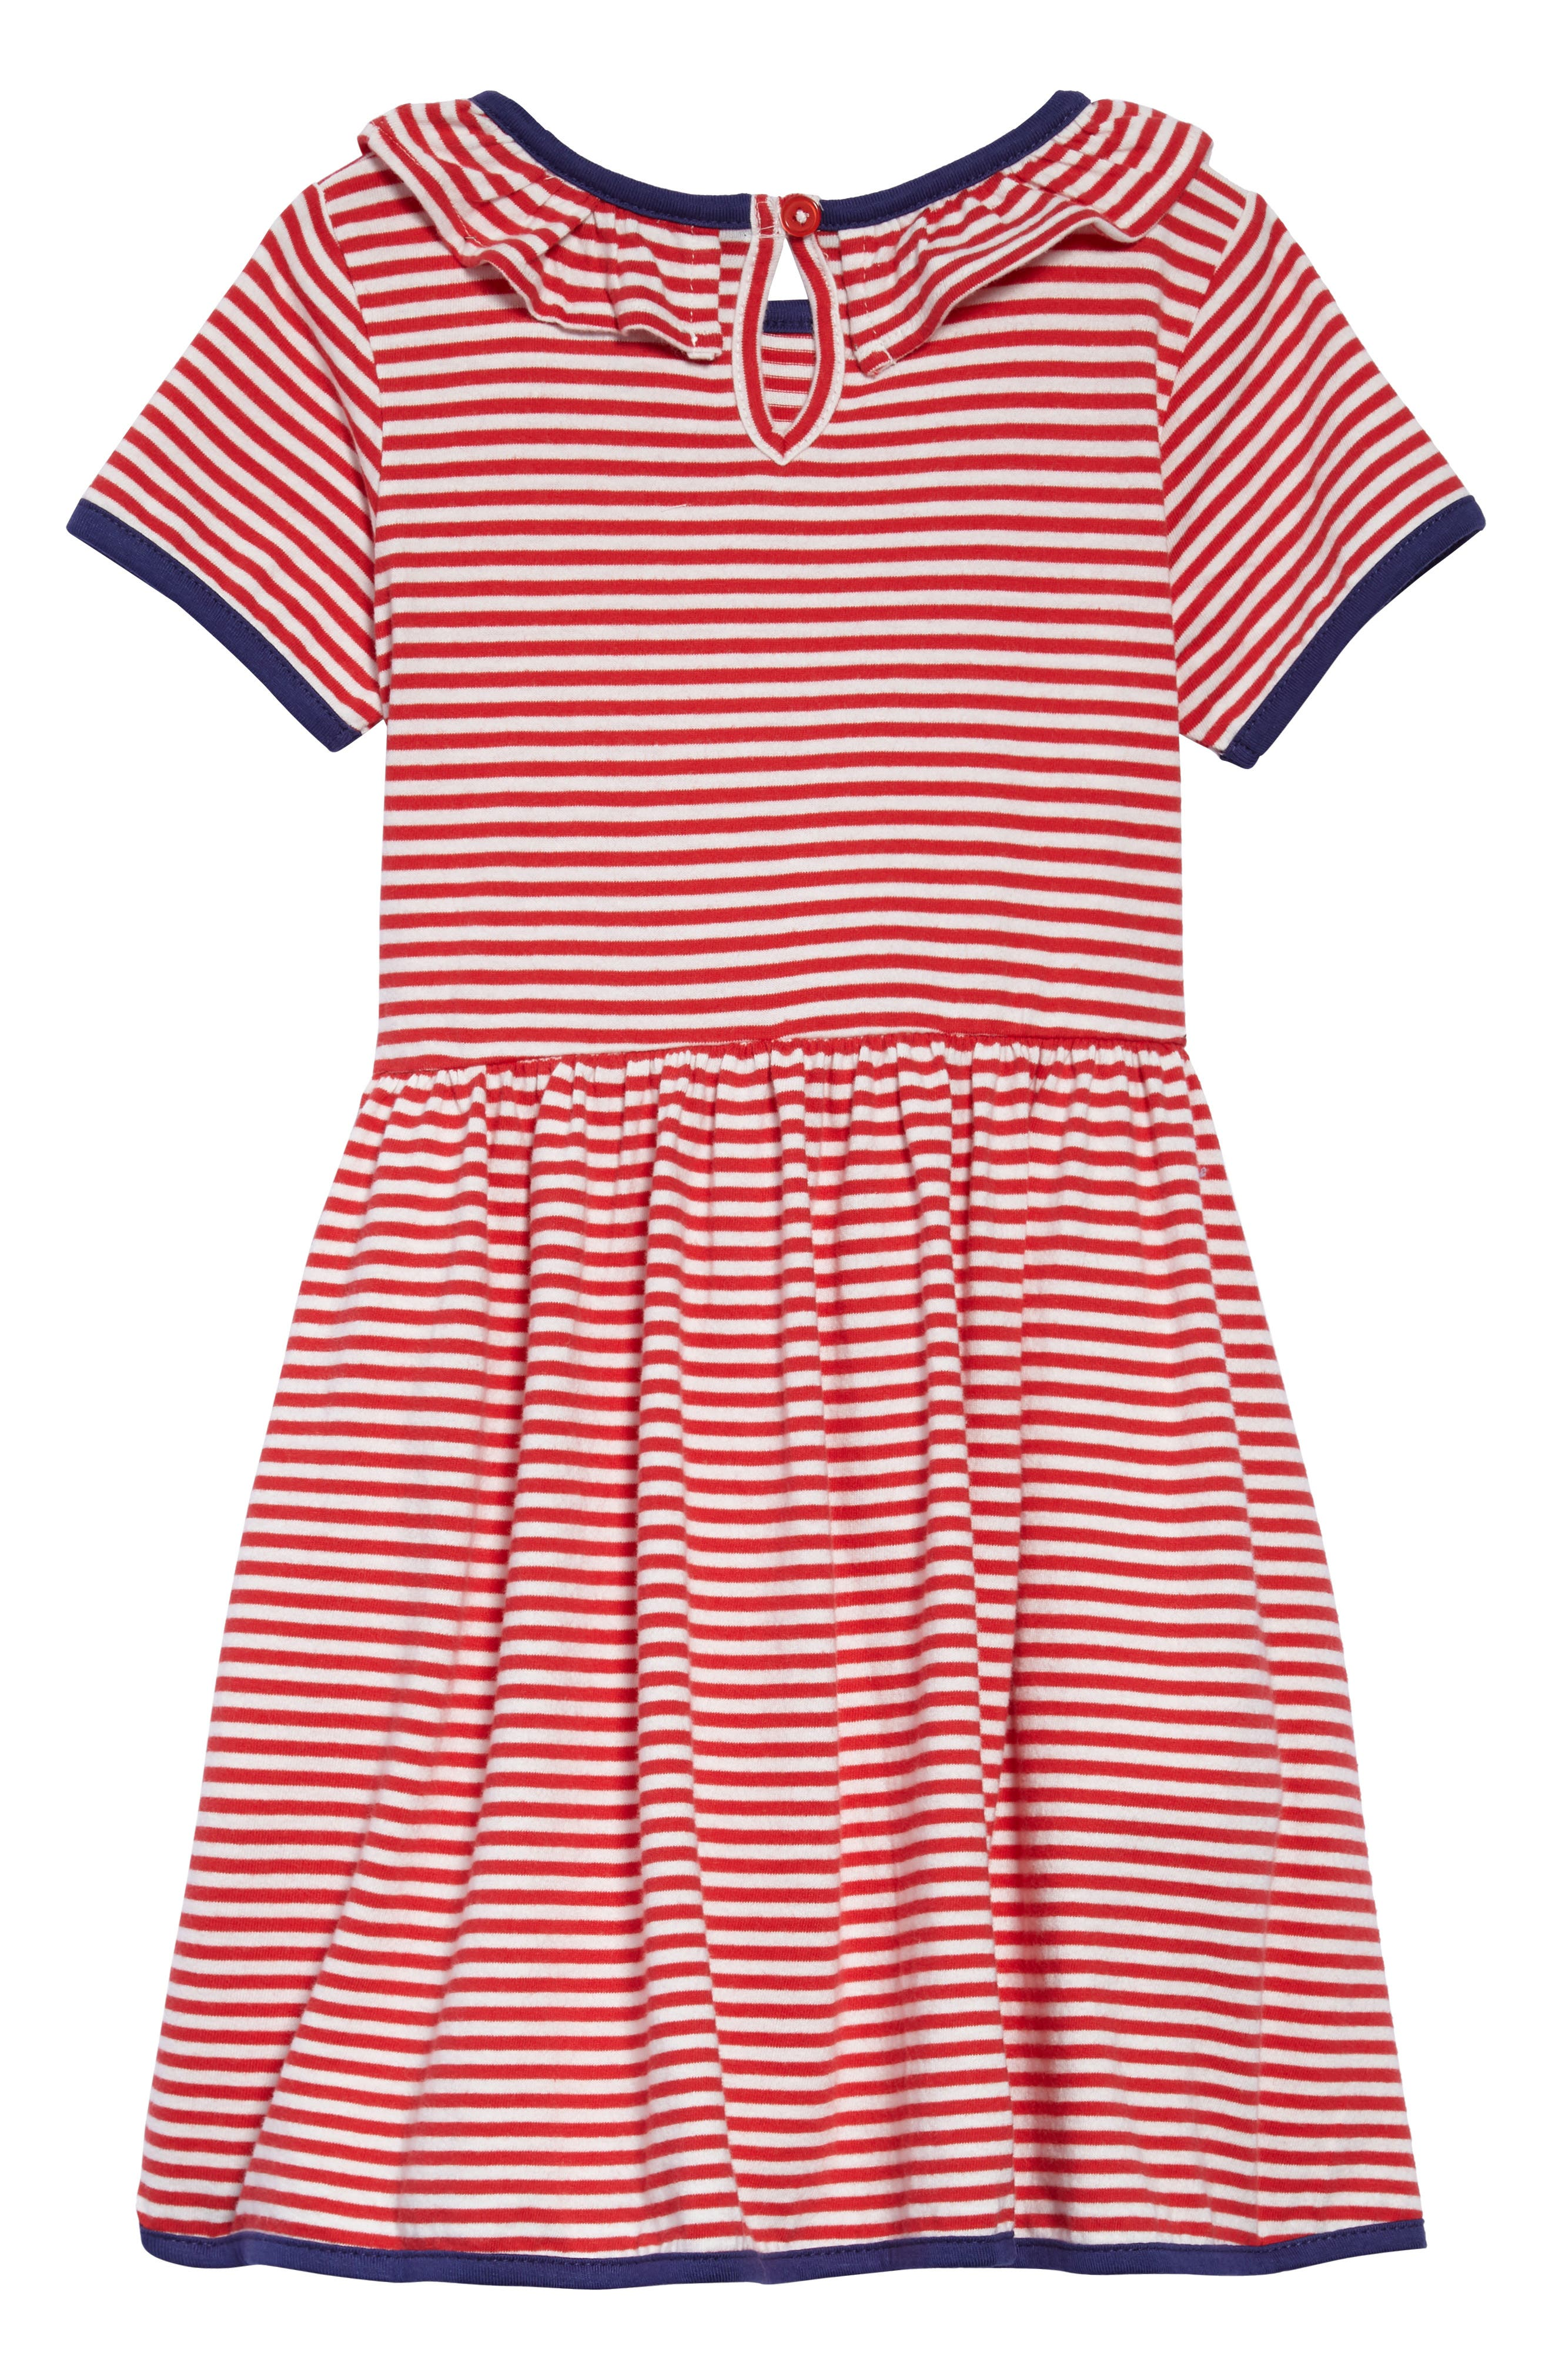 Stripe Jersey Dress,                             Alternate thumbnail 2, color,                             Circus Red/ Ecru